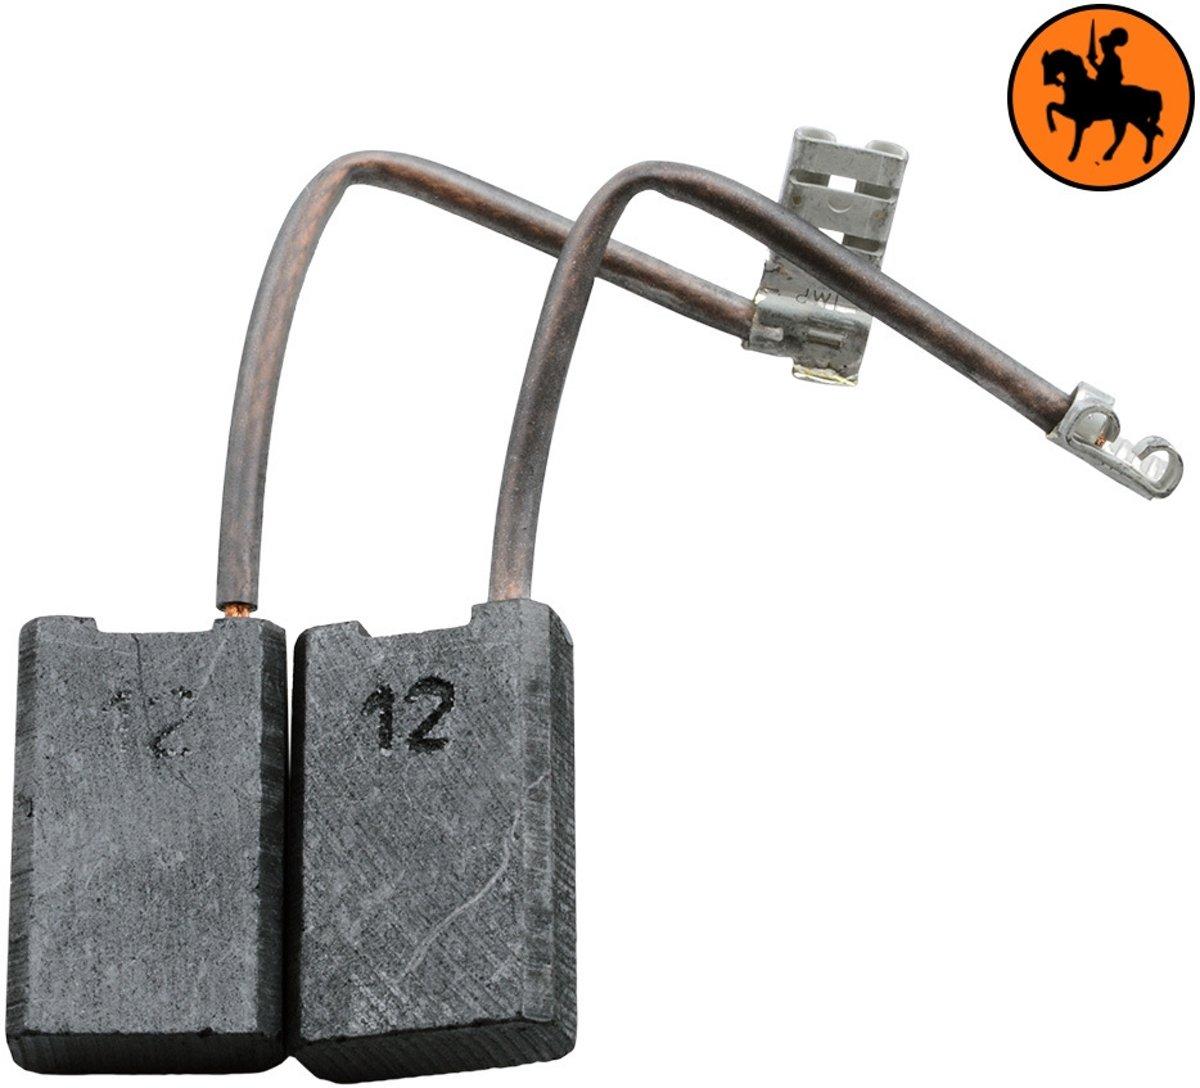 Koolborstelset voor AEG frees/zaag TSDA2000 - 6,3x12,5x20mm kopen